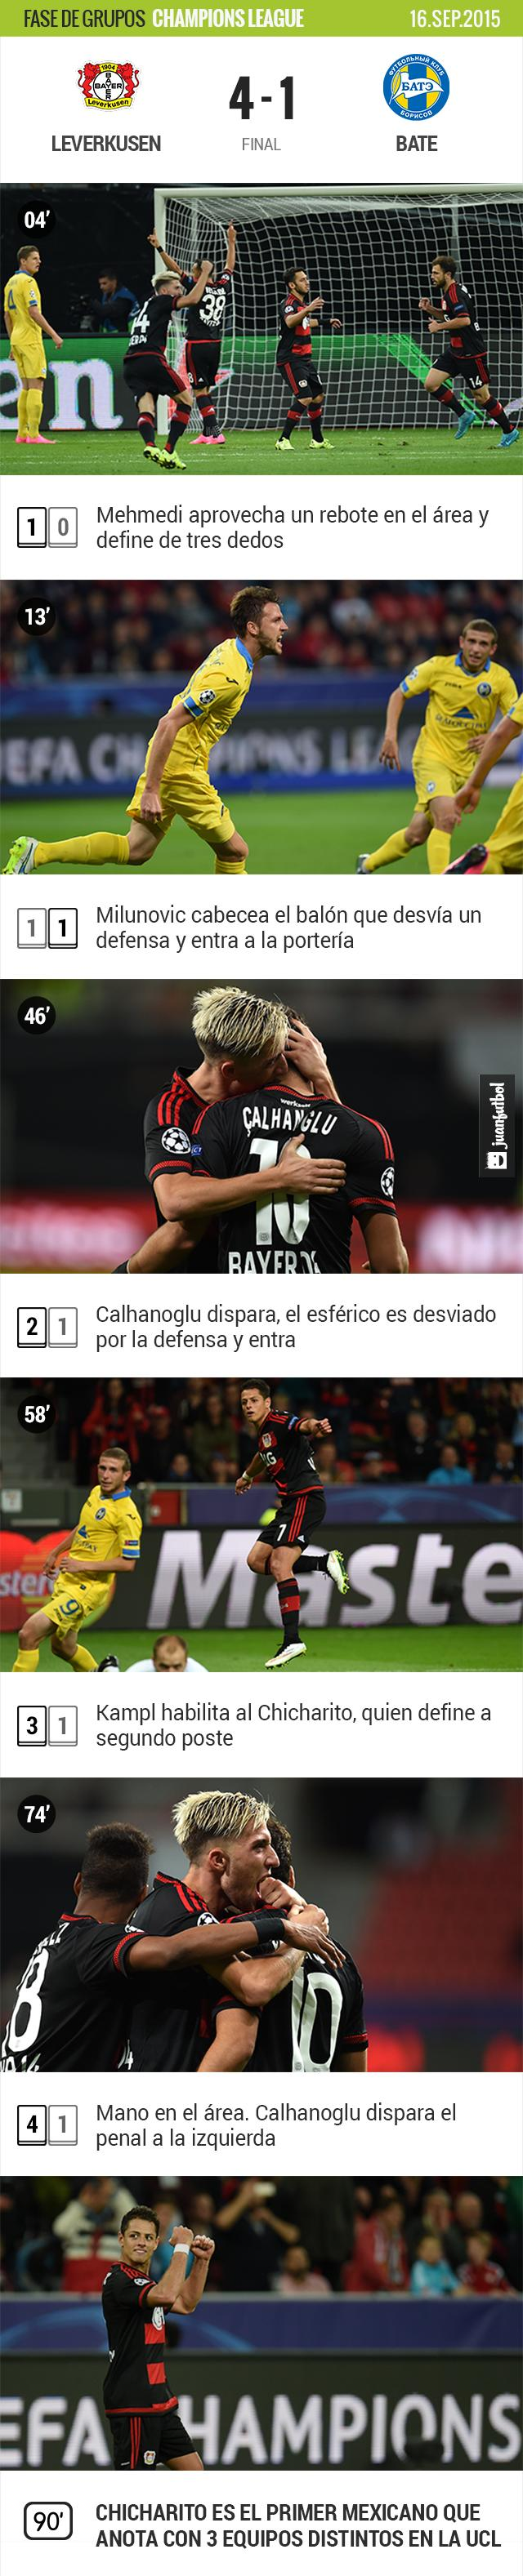 Bayer Leverkusen-Bate